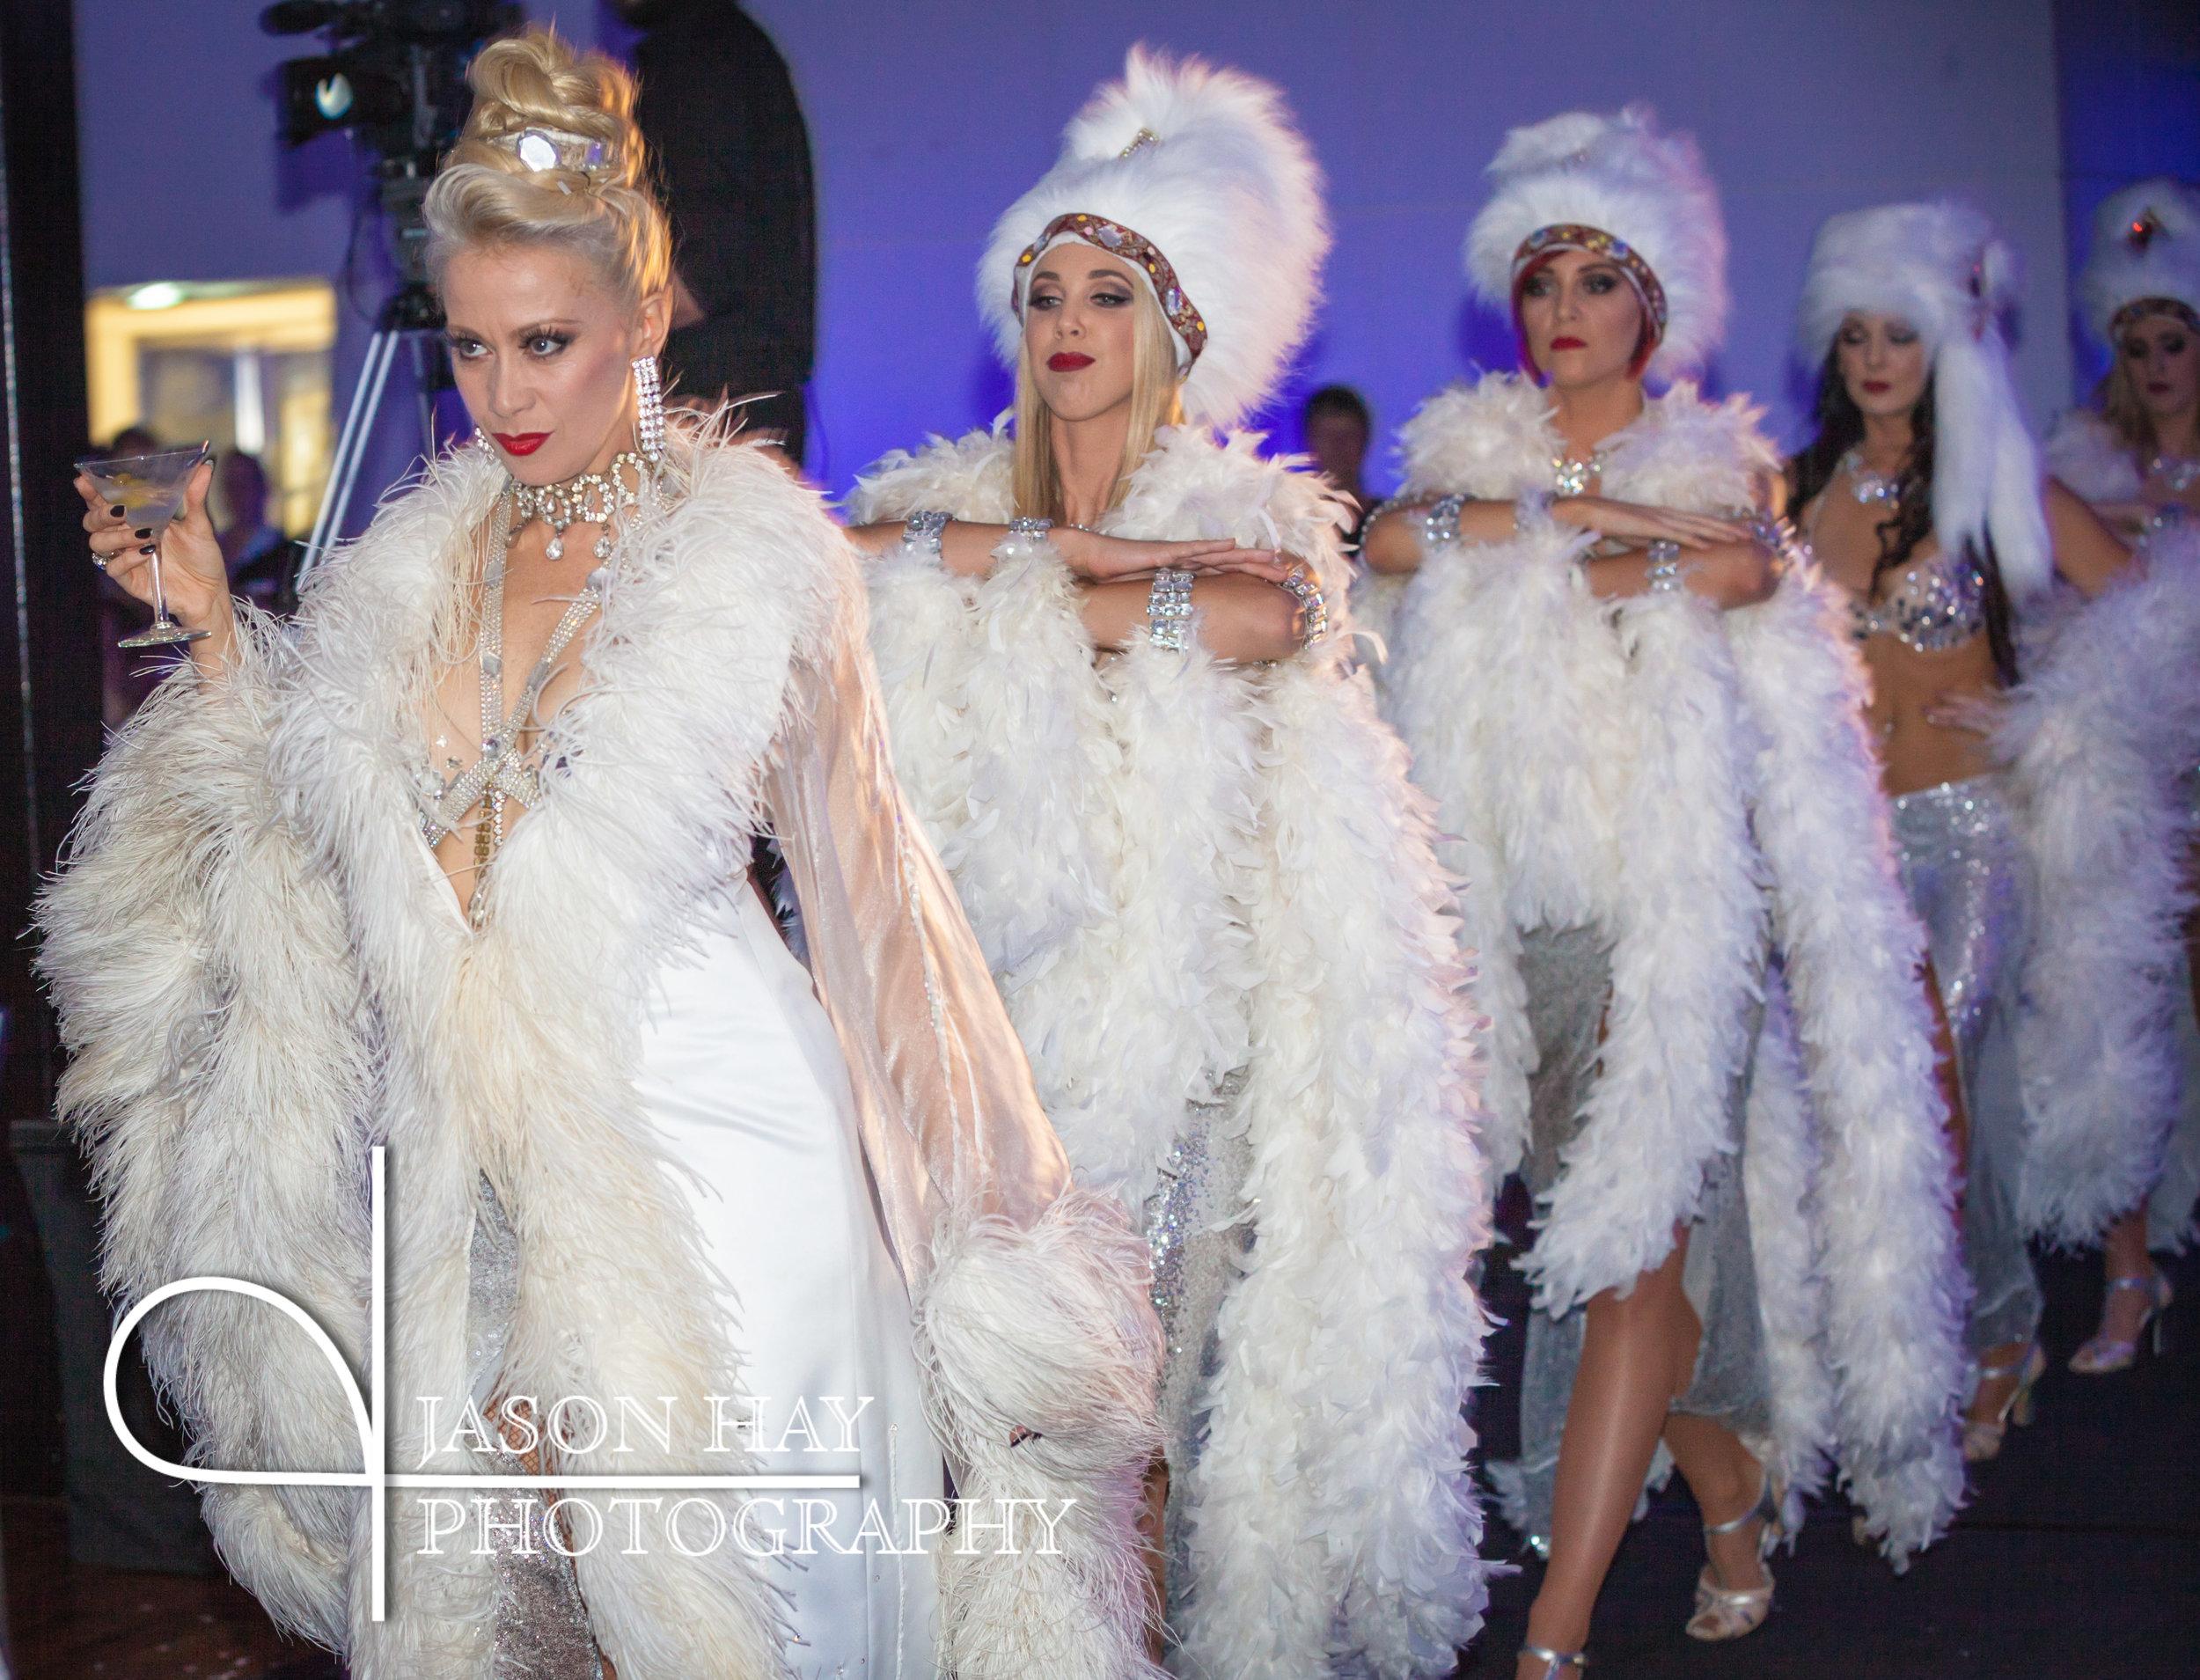 James Bond Ladies | Dancers | Steps Grand Winter Ball